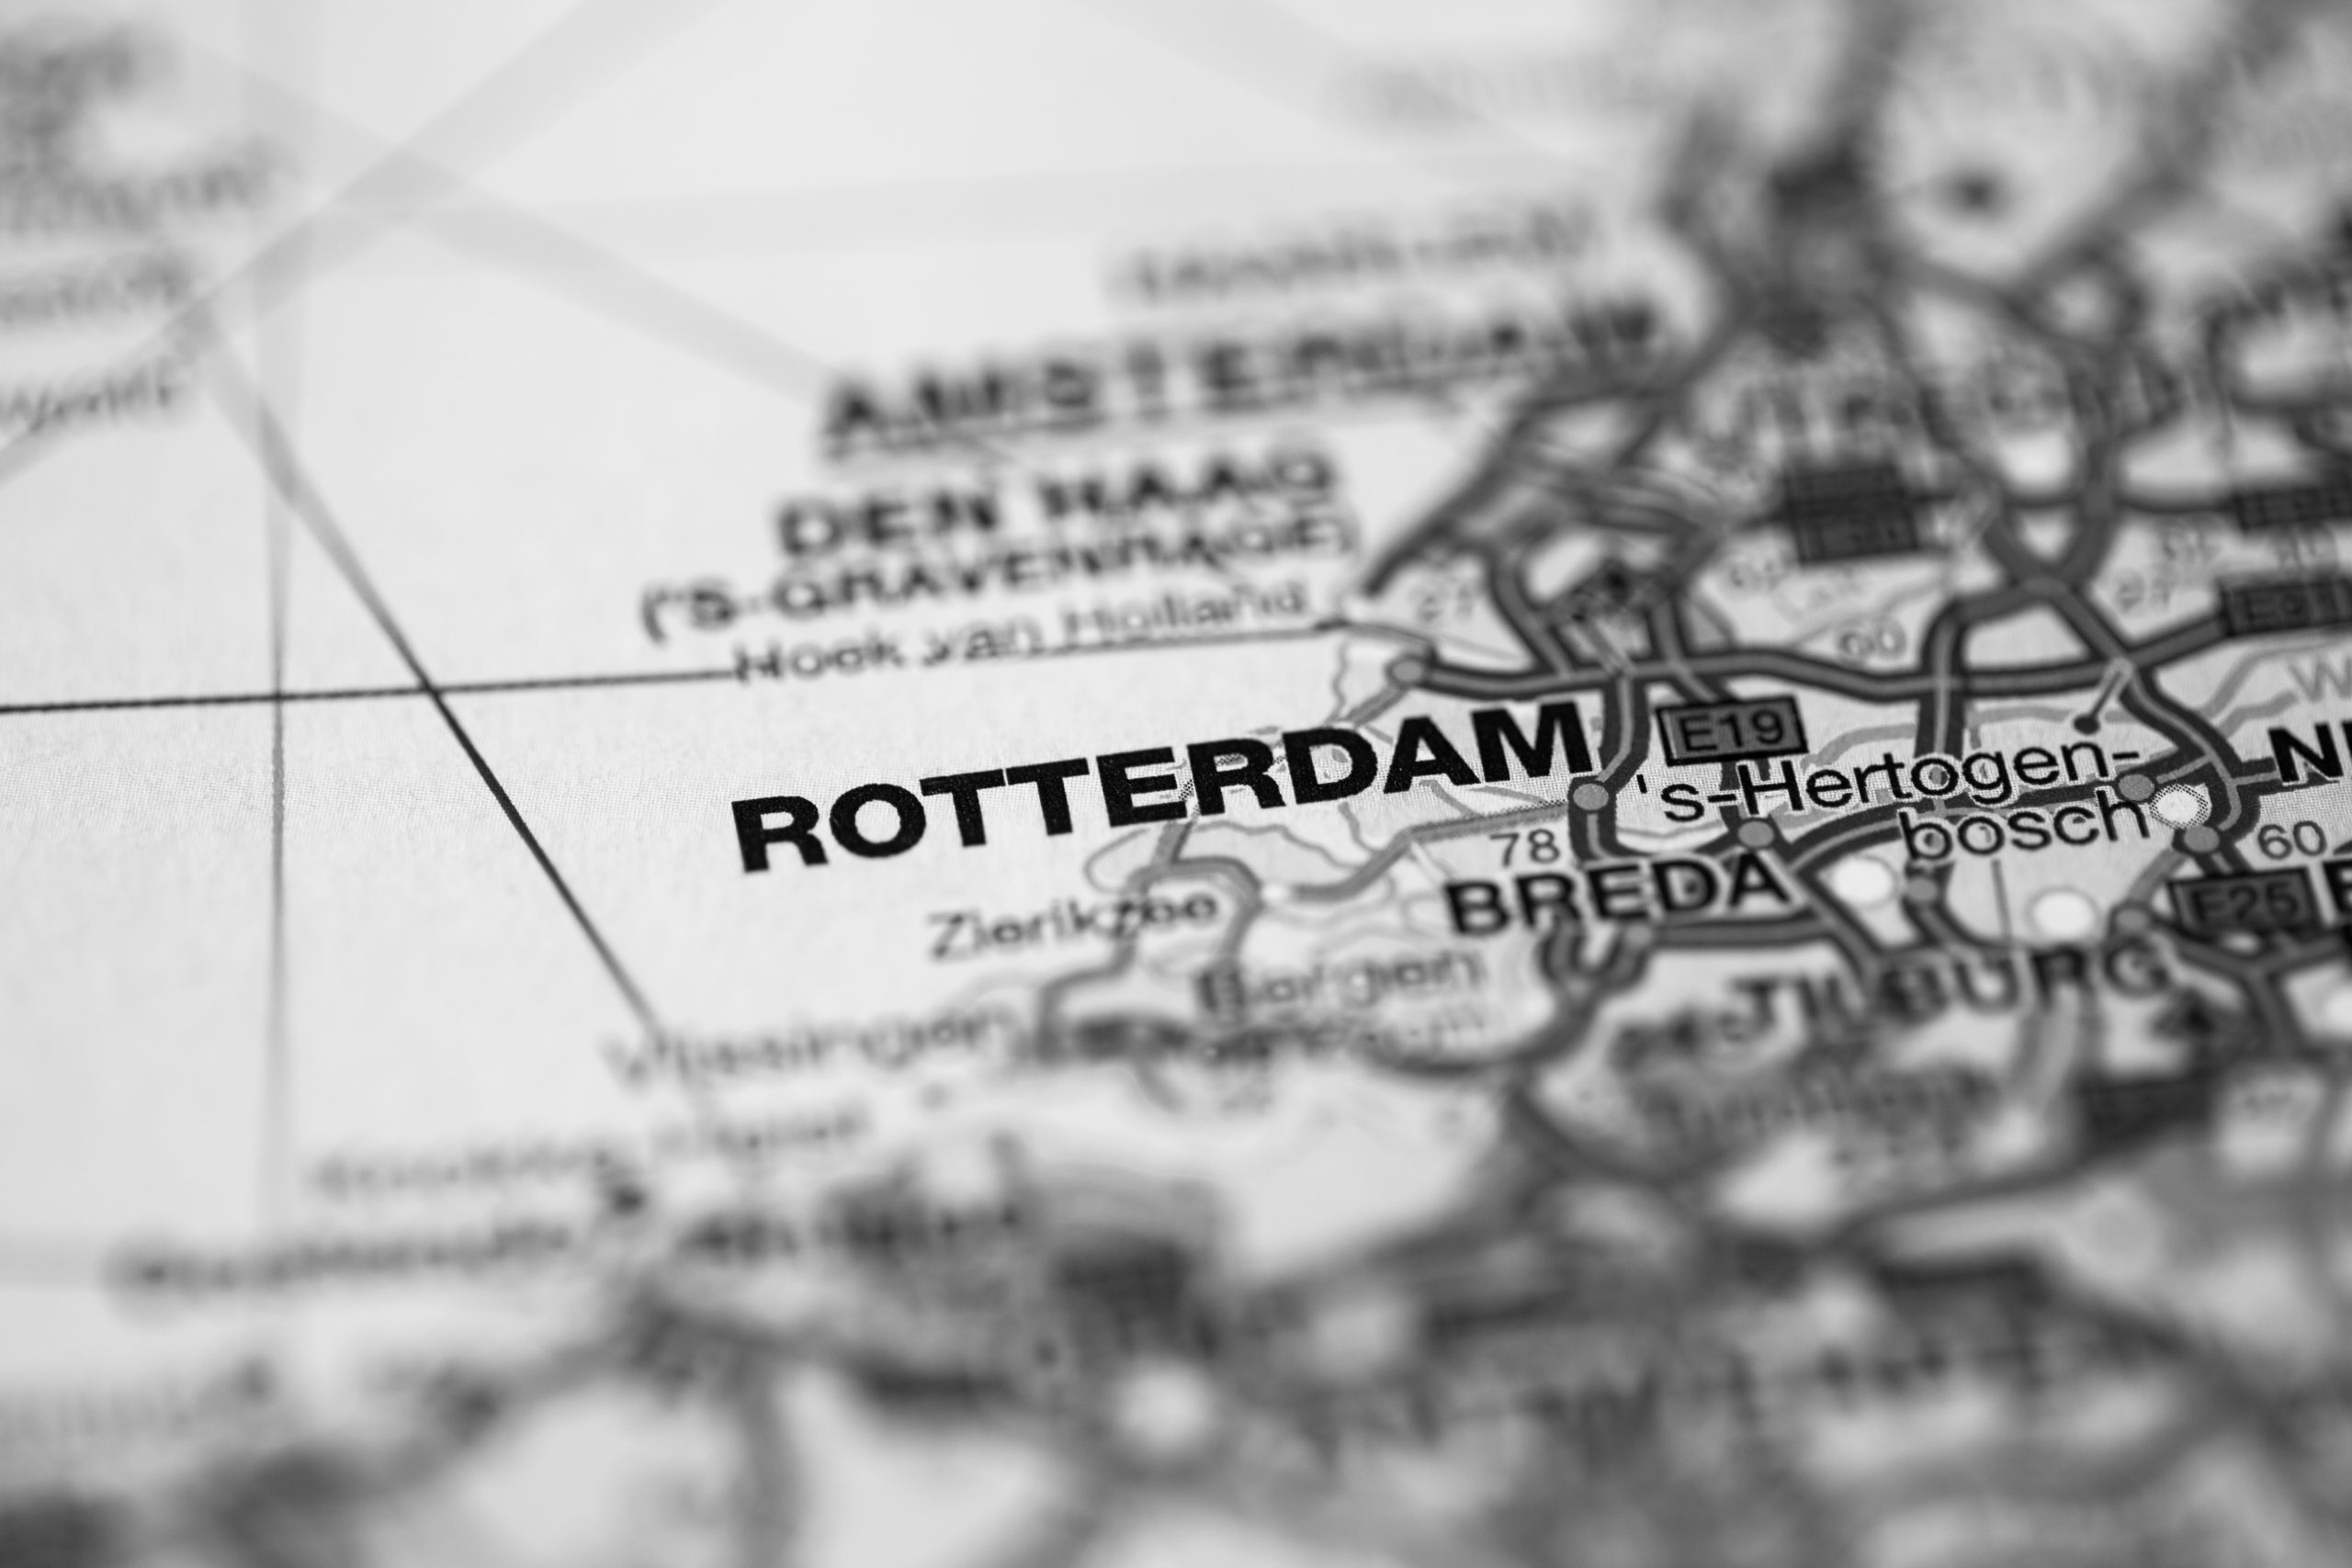 Sues Rijschool Rotterdam en omgeving